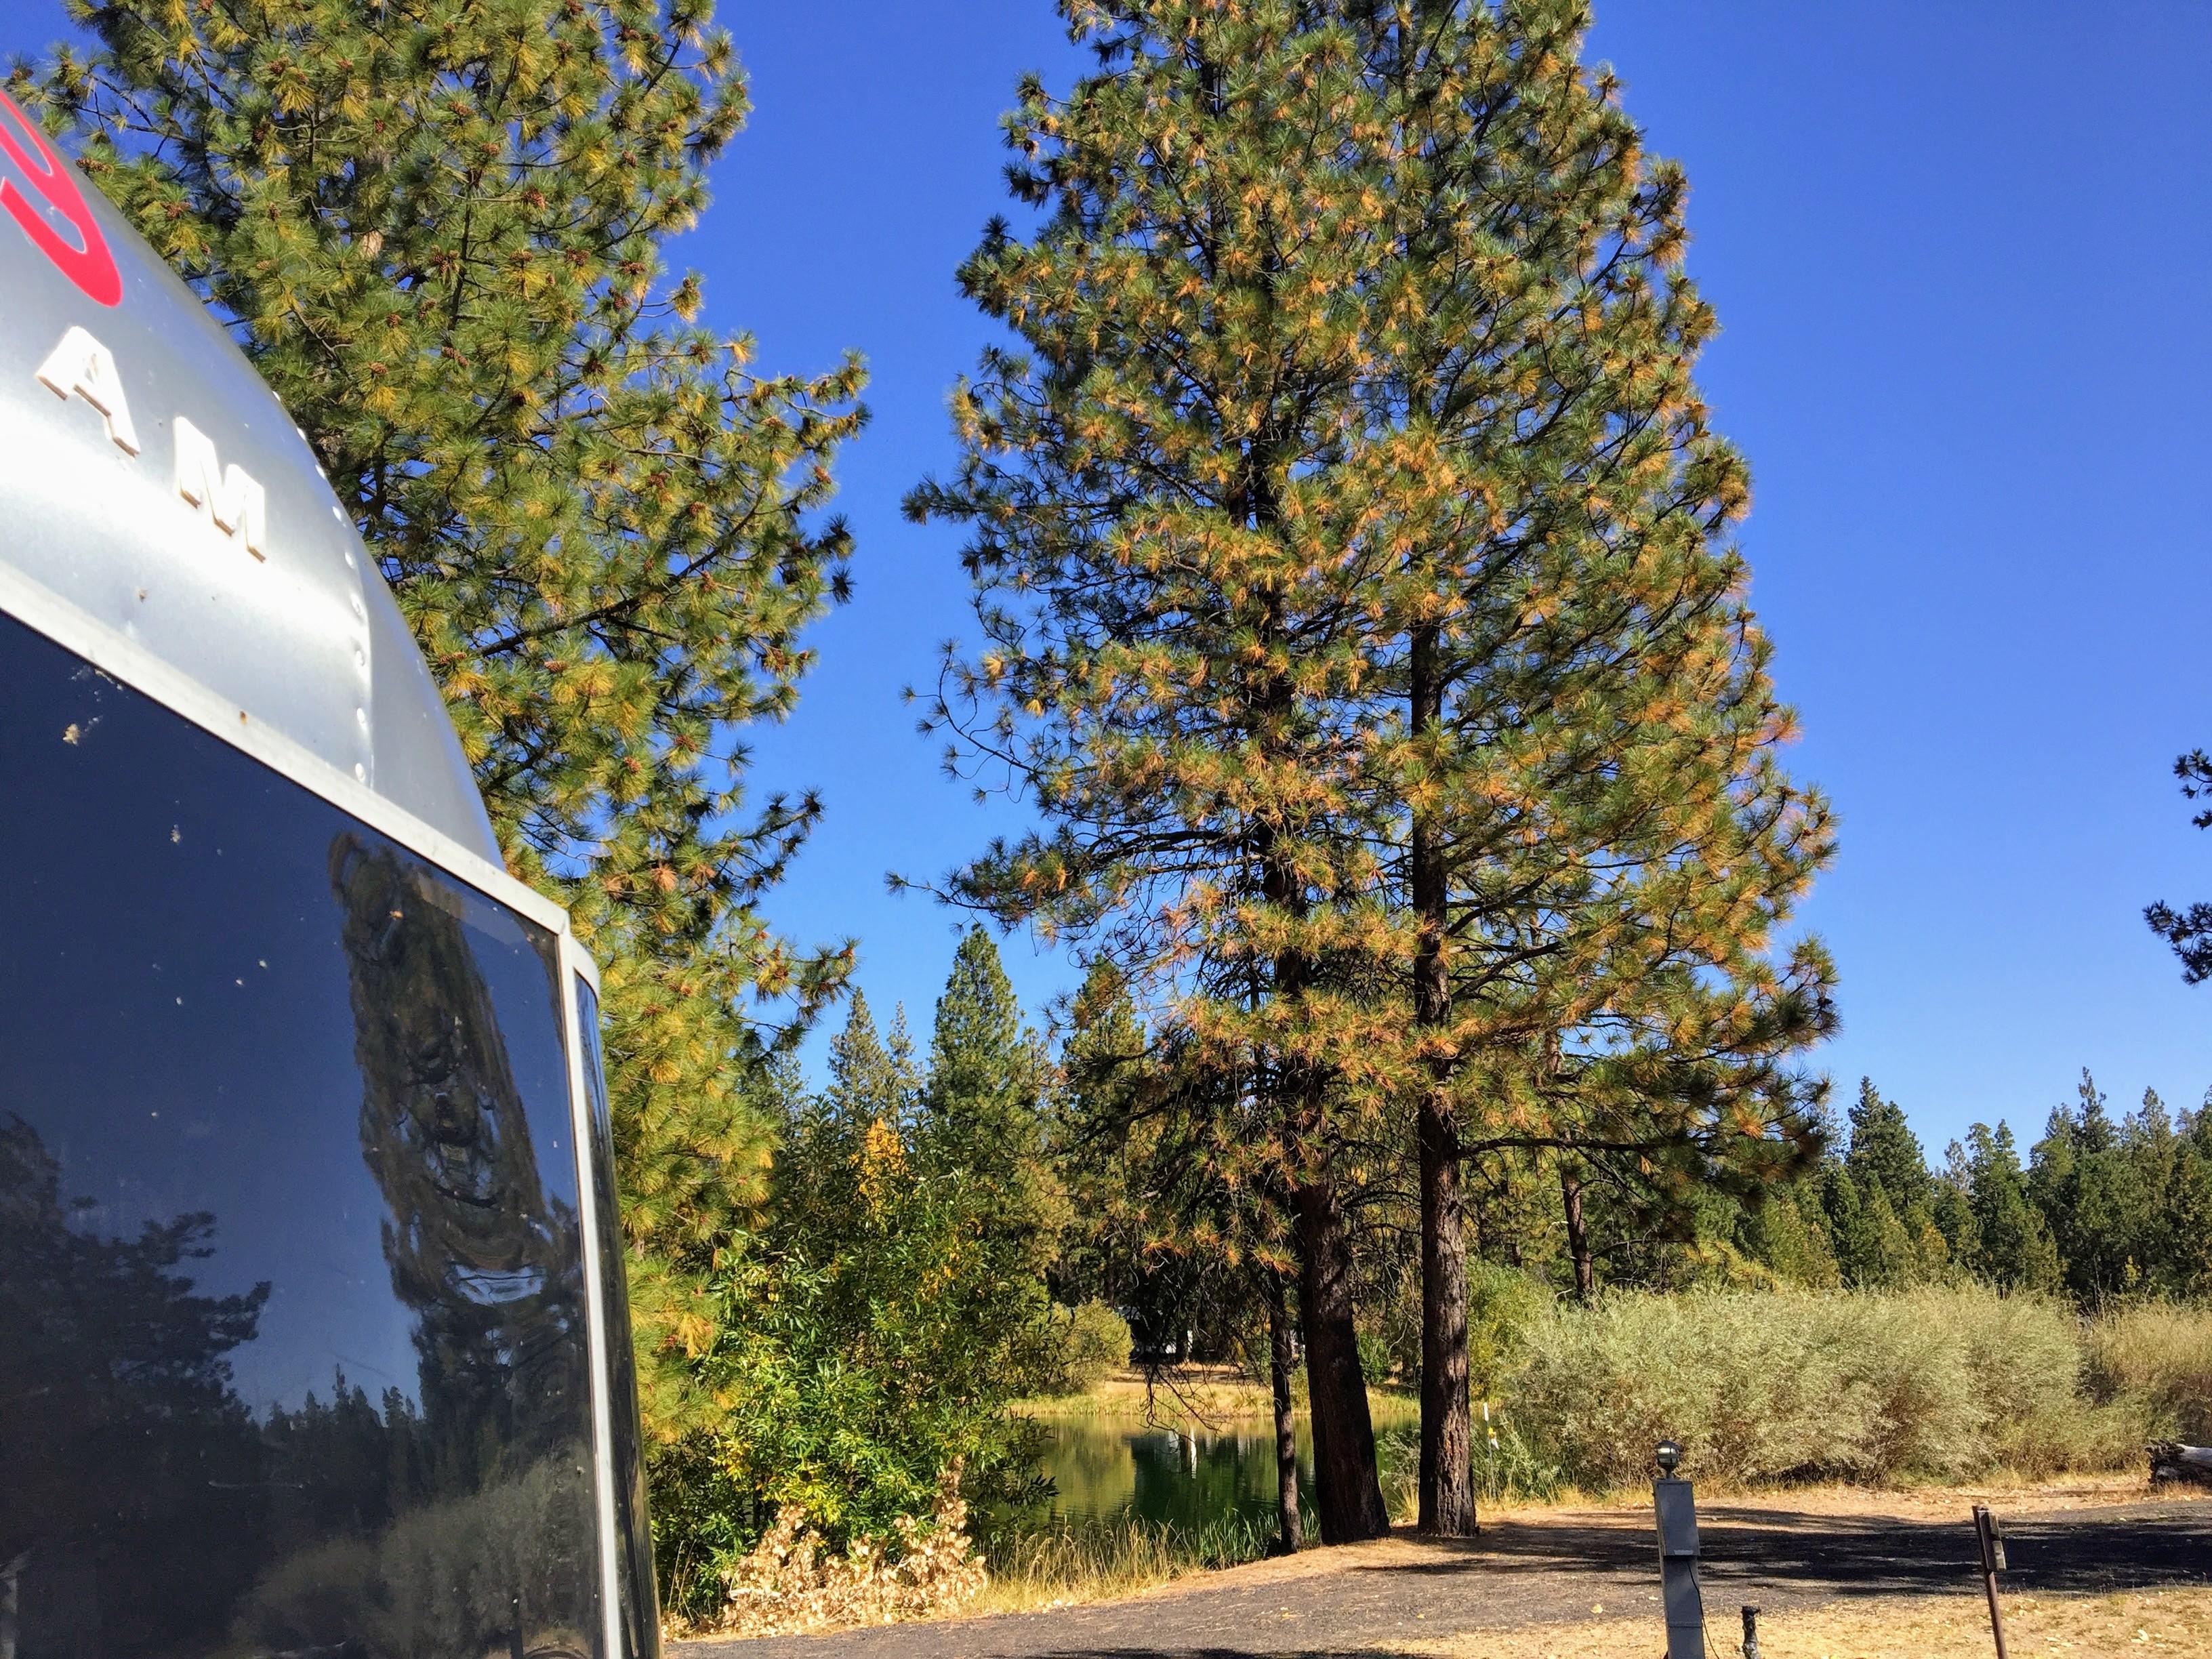 2017-10-05 California 03 Rancheria 01